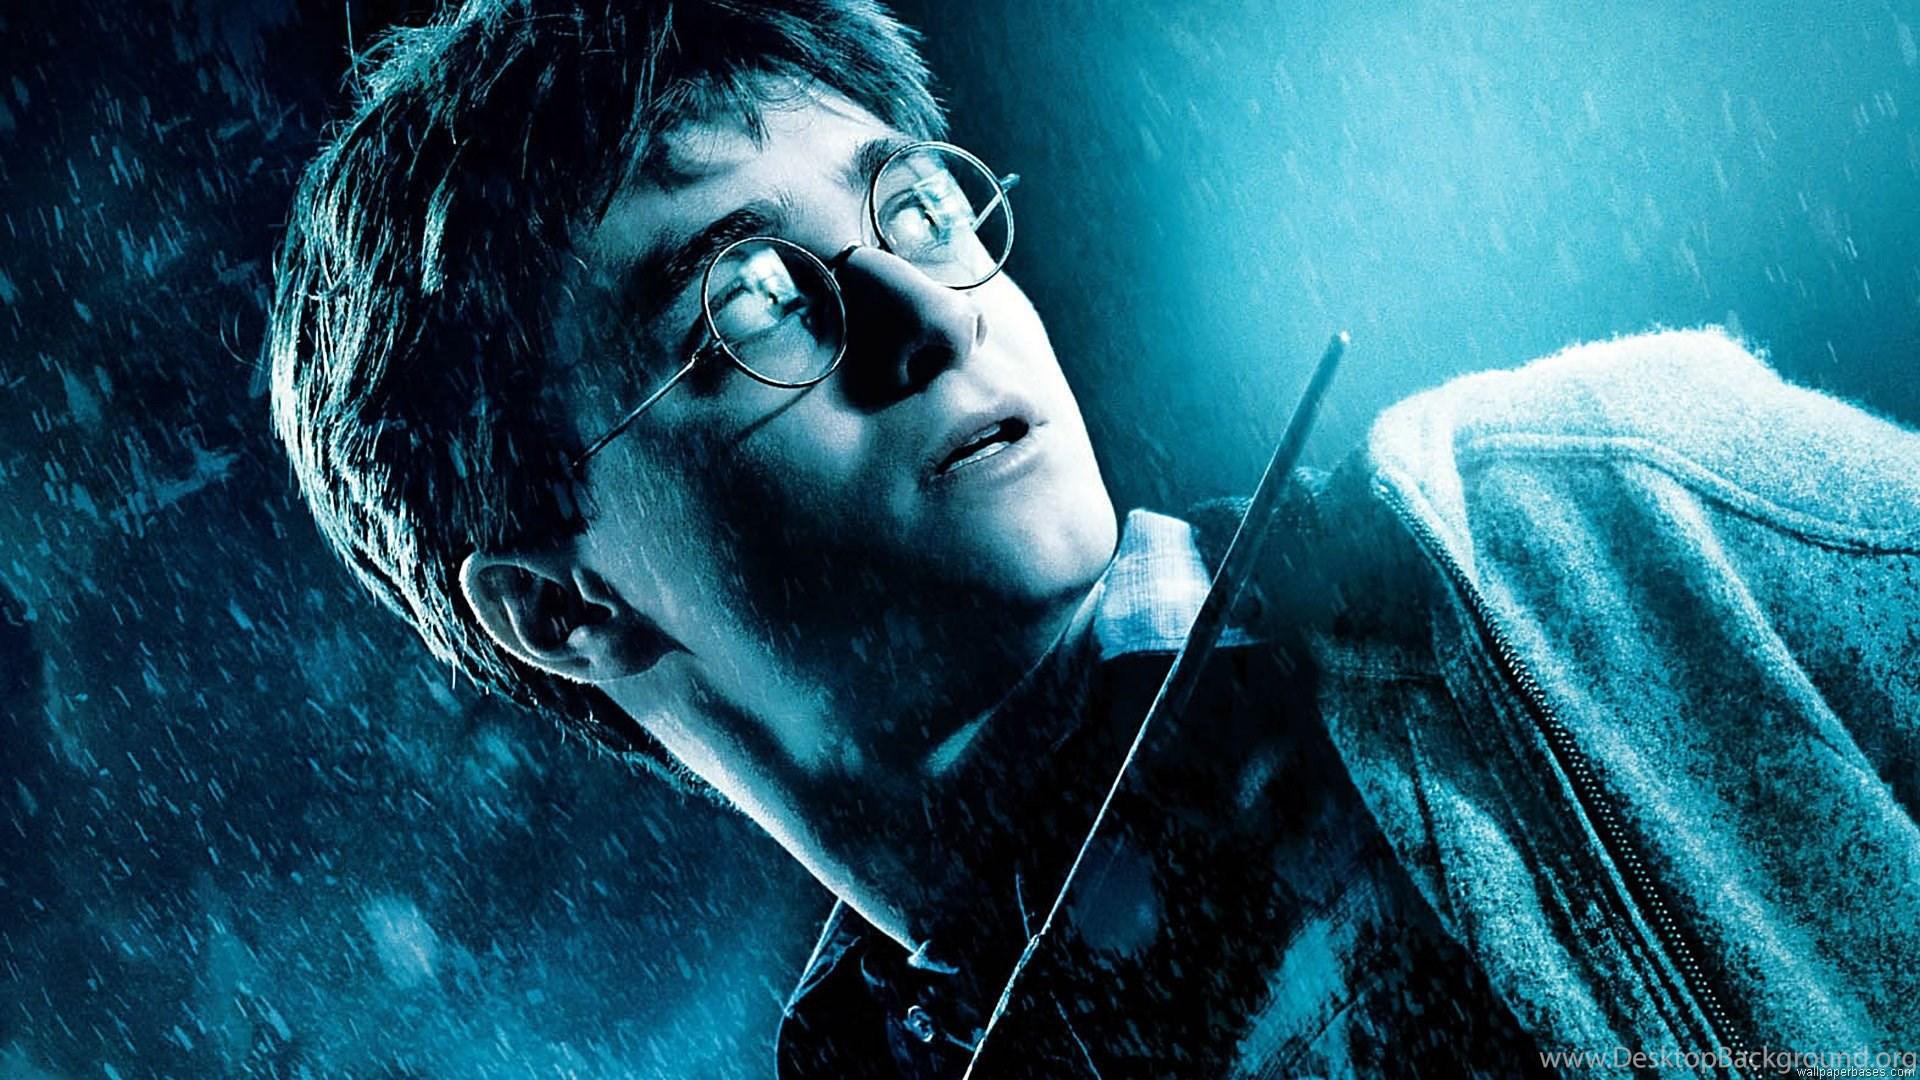 Most Inspiring Wallpaper Harry Potter Blue - 607734_35-harry-potter-wallpapers-35-210-harry-potter-hd-wallpapers_1920x1080_h  Collection_47388.jpg